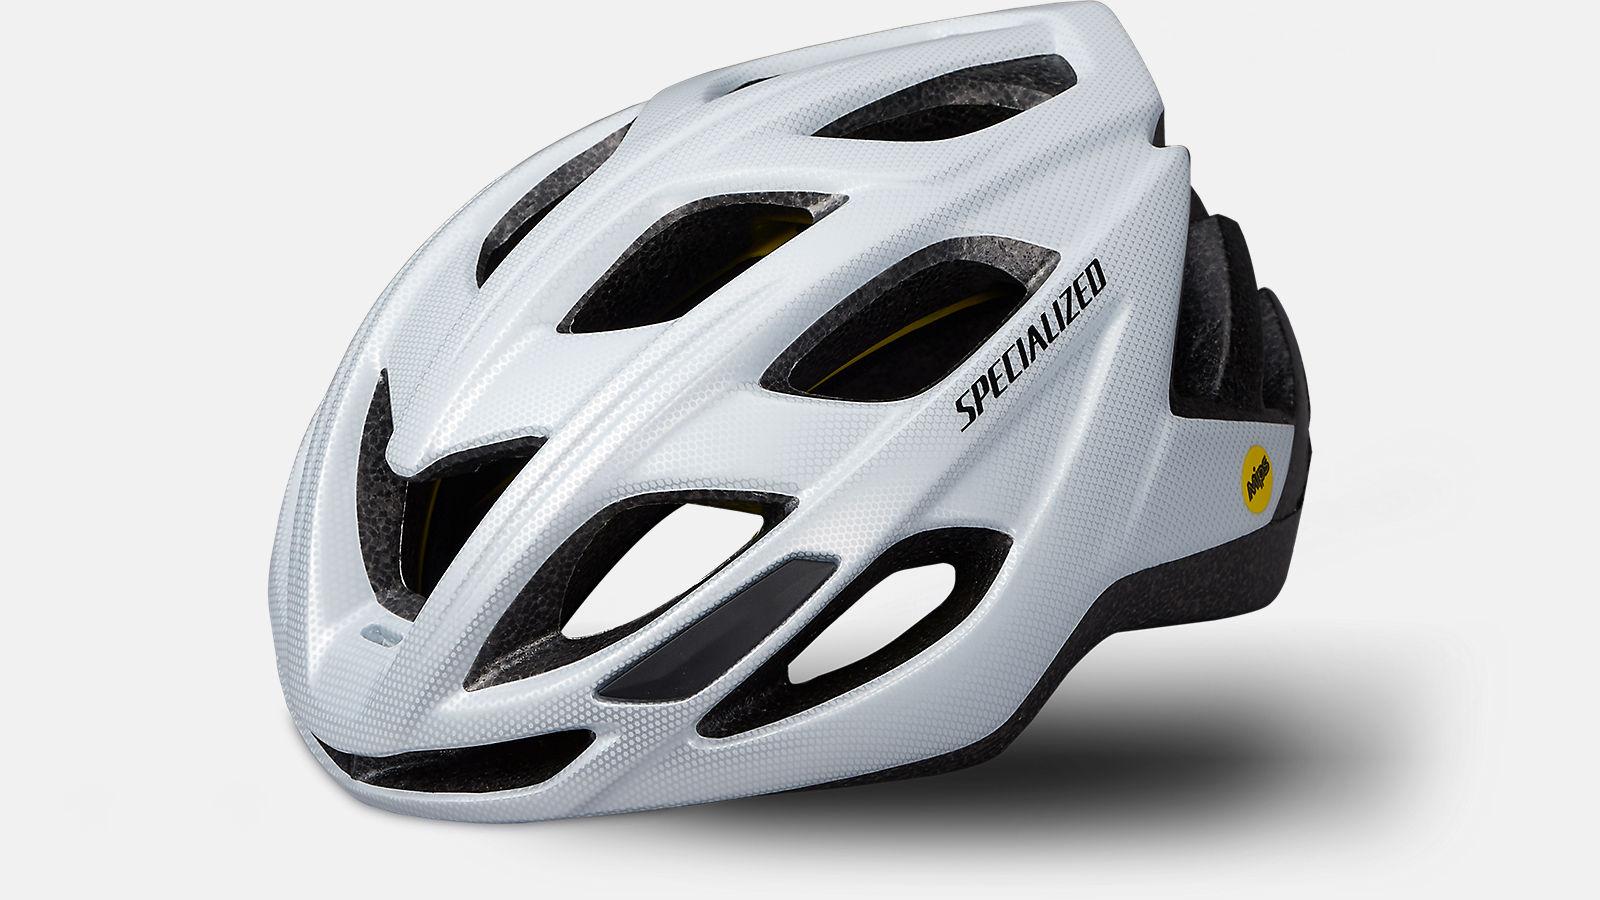 MIPS-equipped Specialized Chamonix II bike helmet